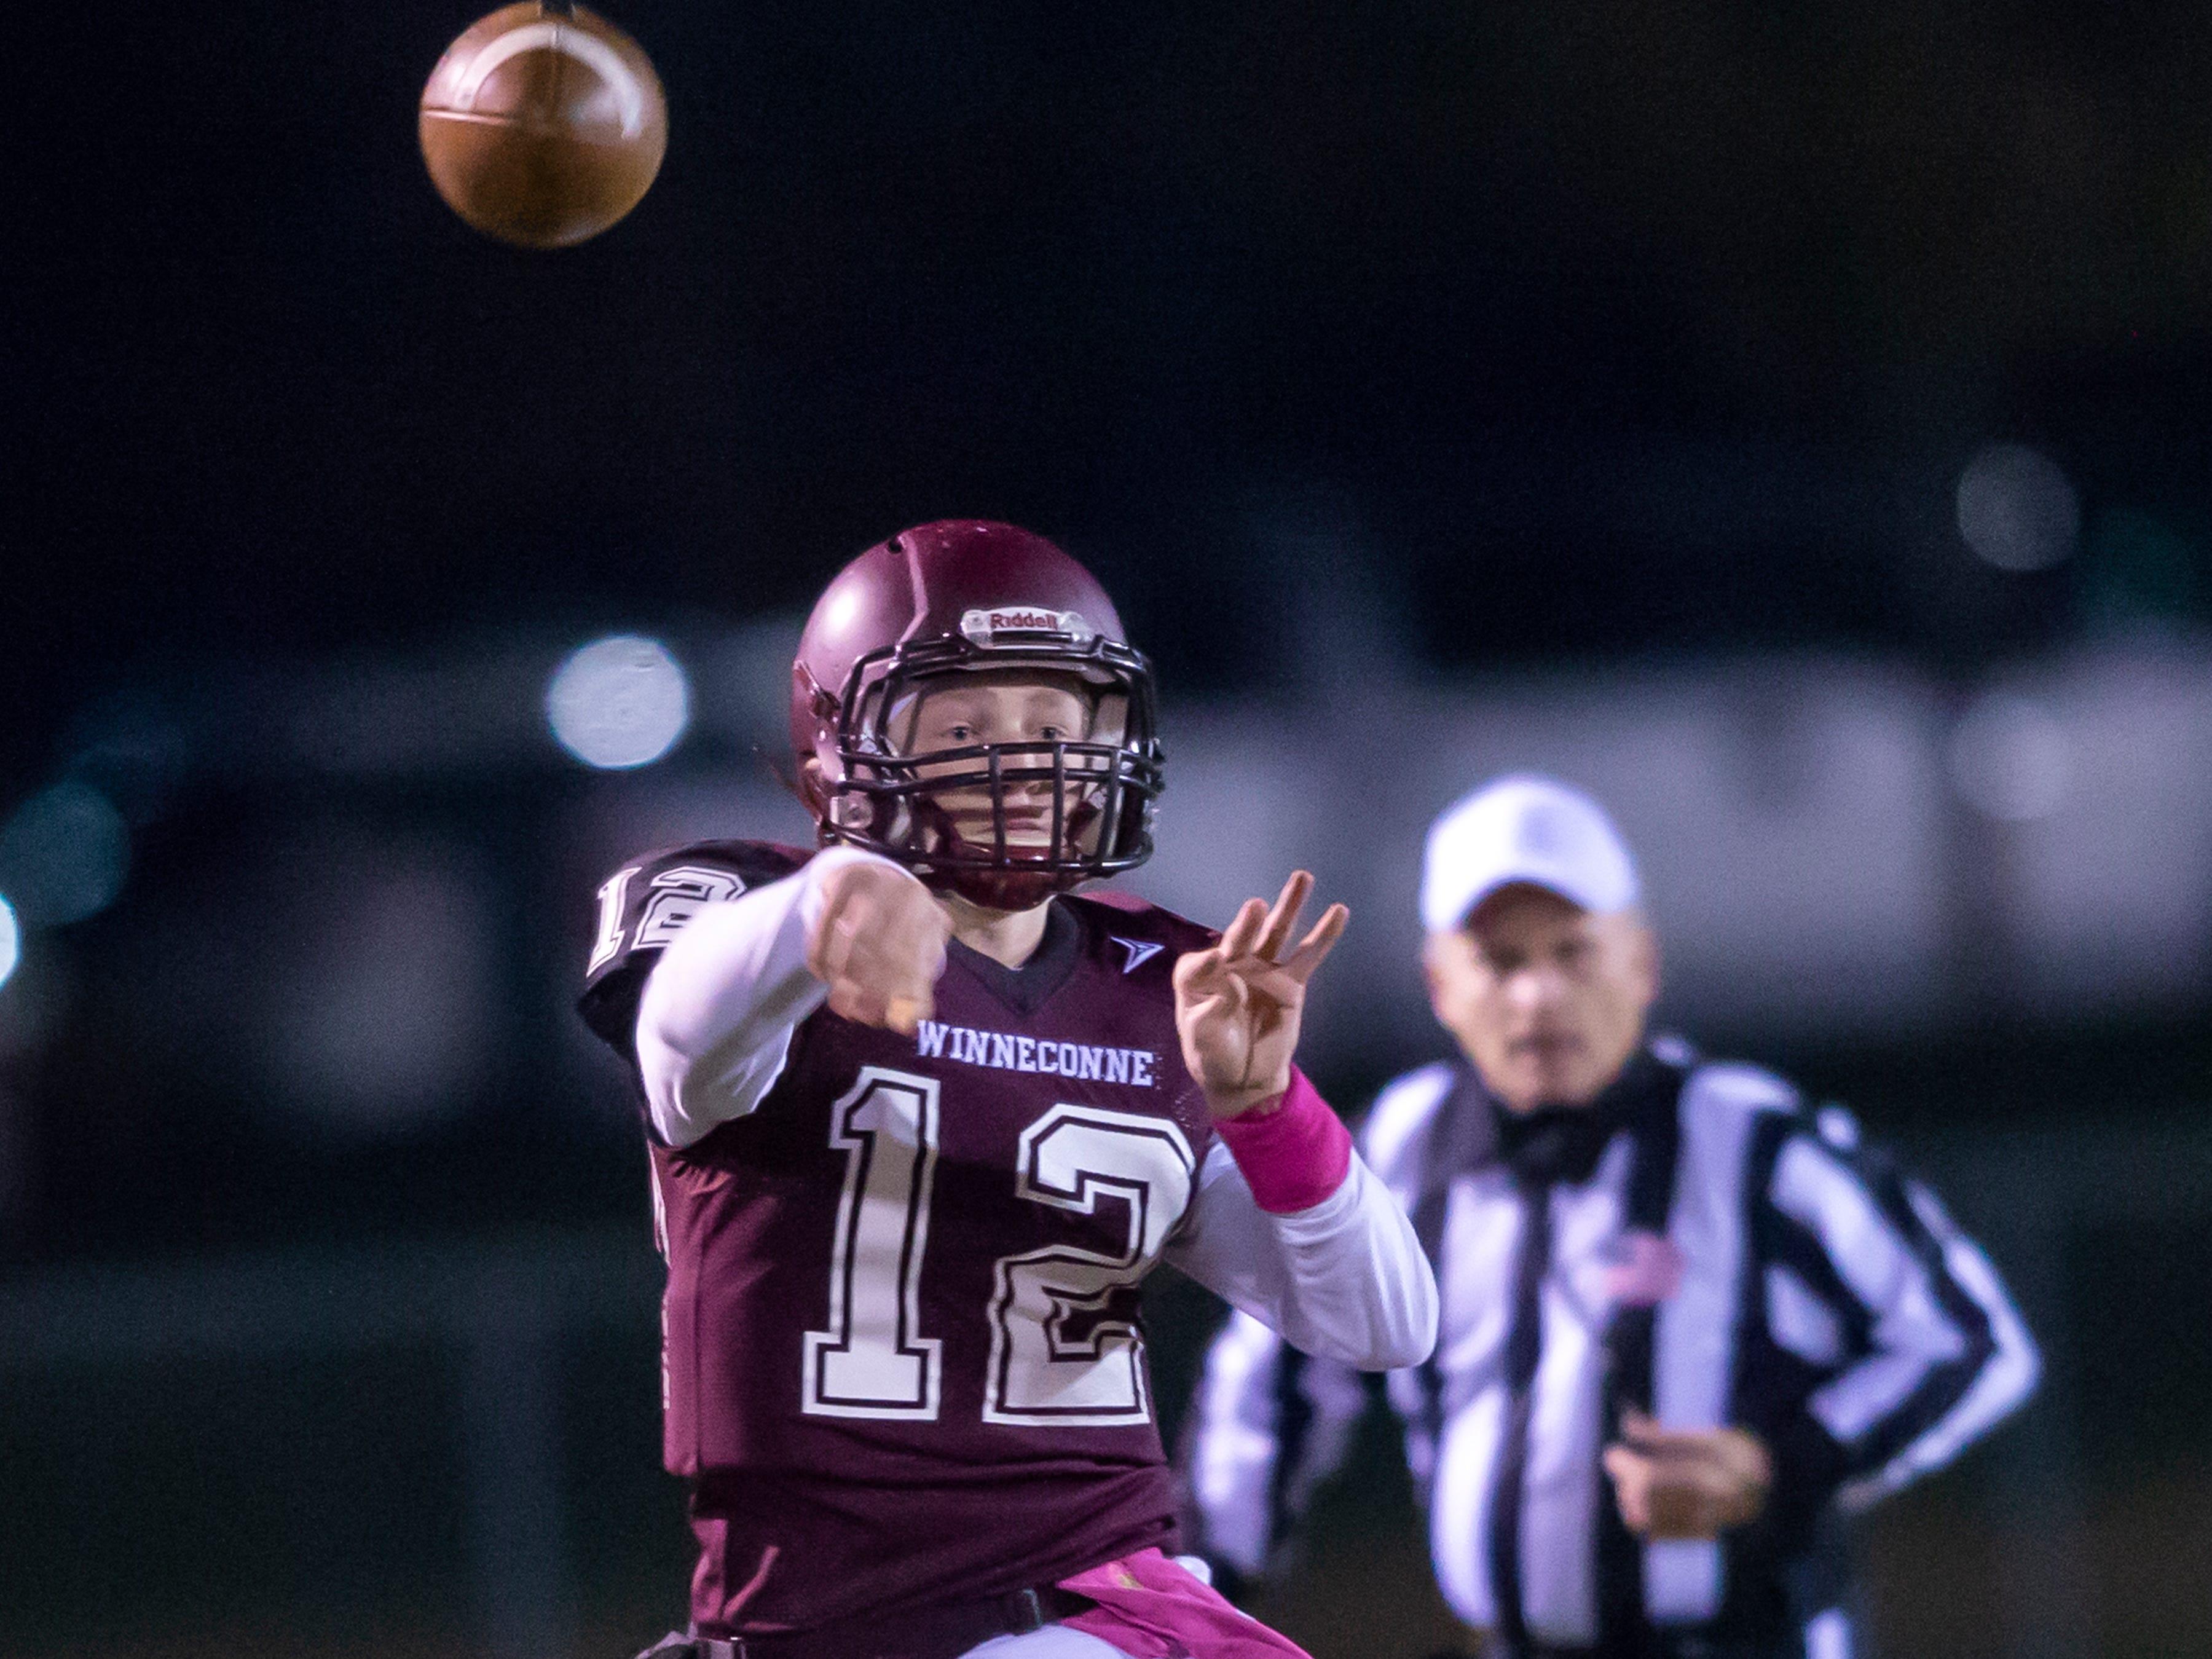 Winneconne's Harrison Roubidoux throws a pass at Winneconne High School on Friday, October 26, 2018.